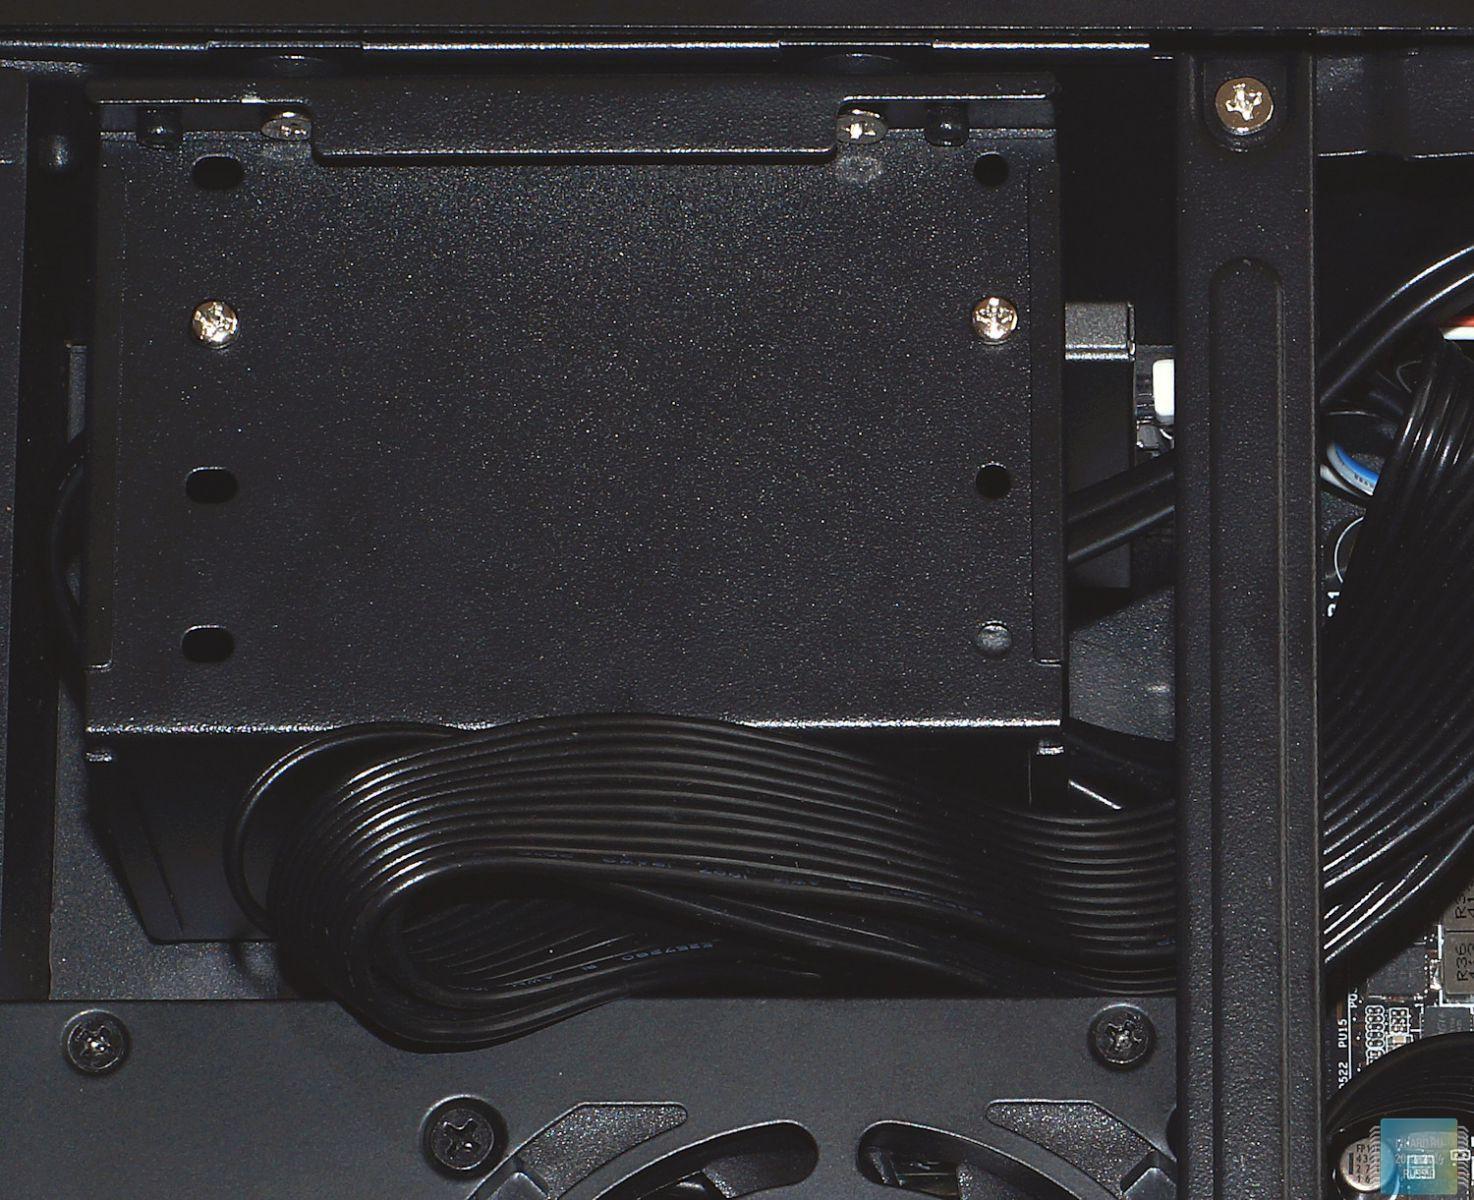 Особенности сборки в Slim HTPC-корпусе SilverStone ML09